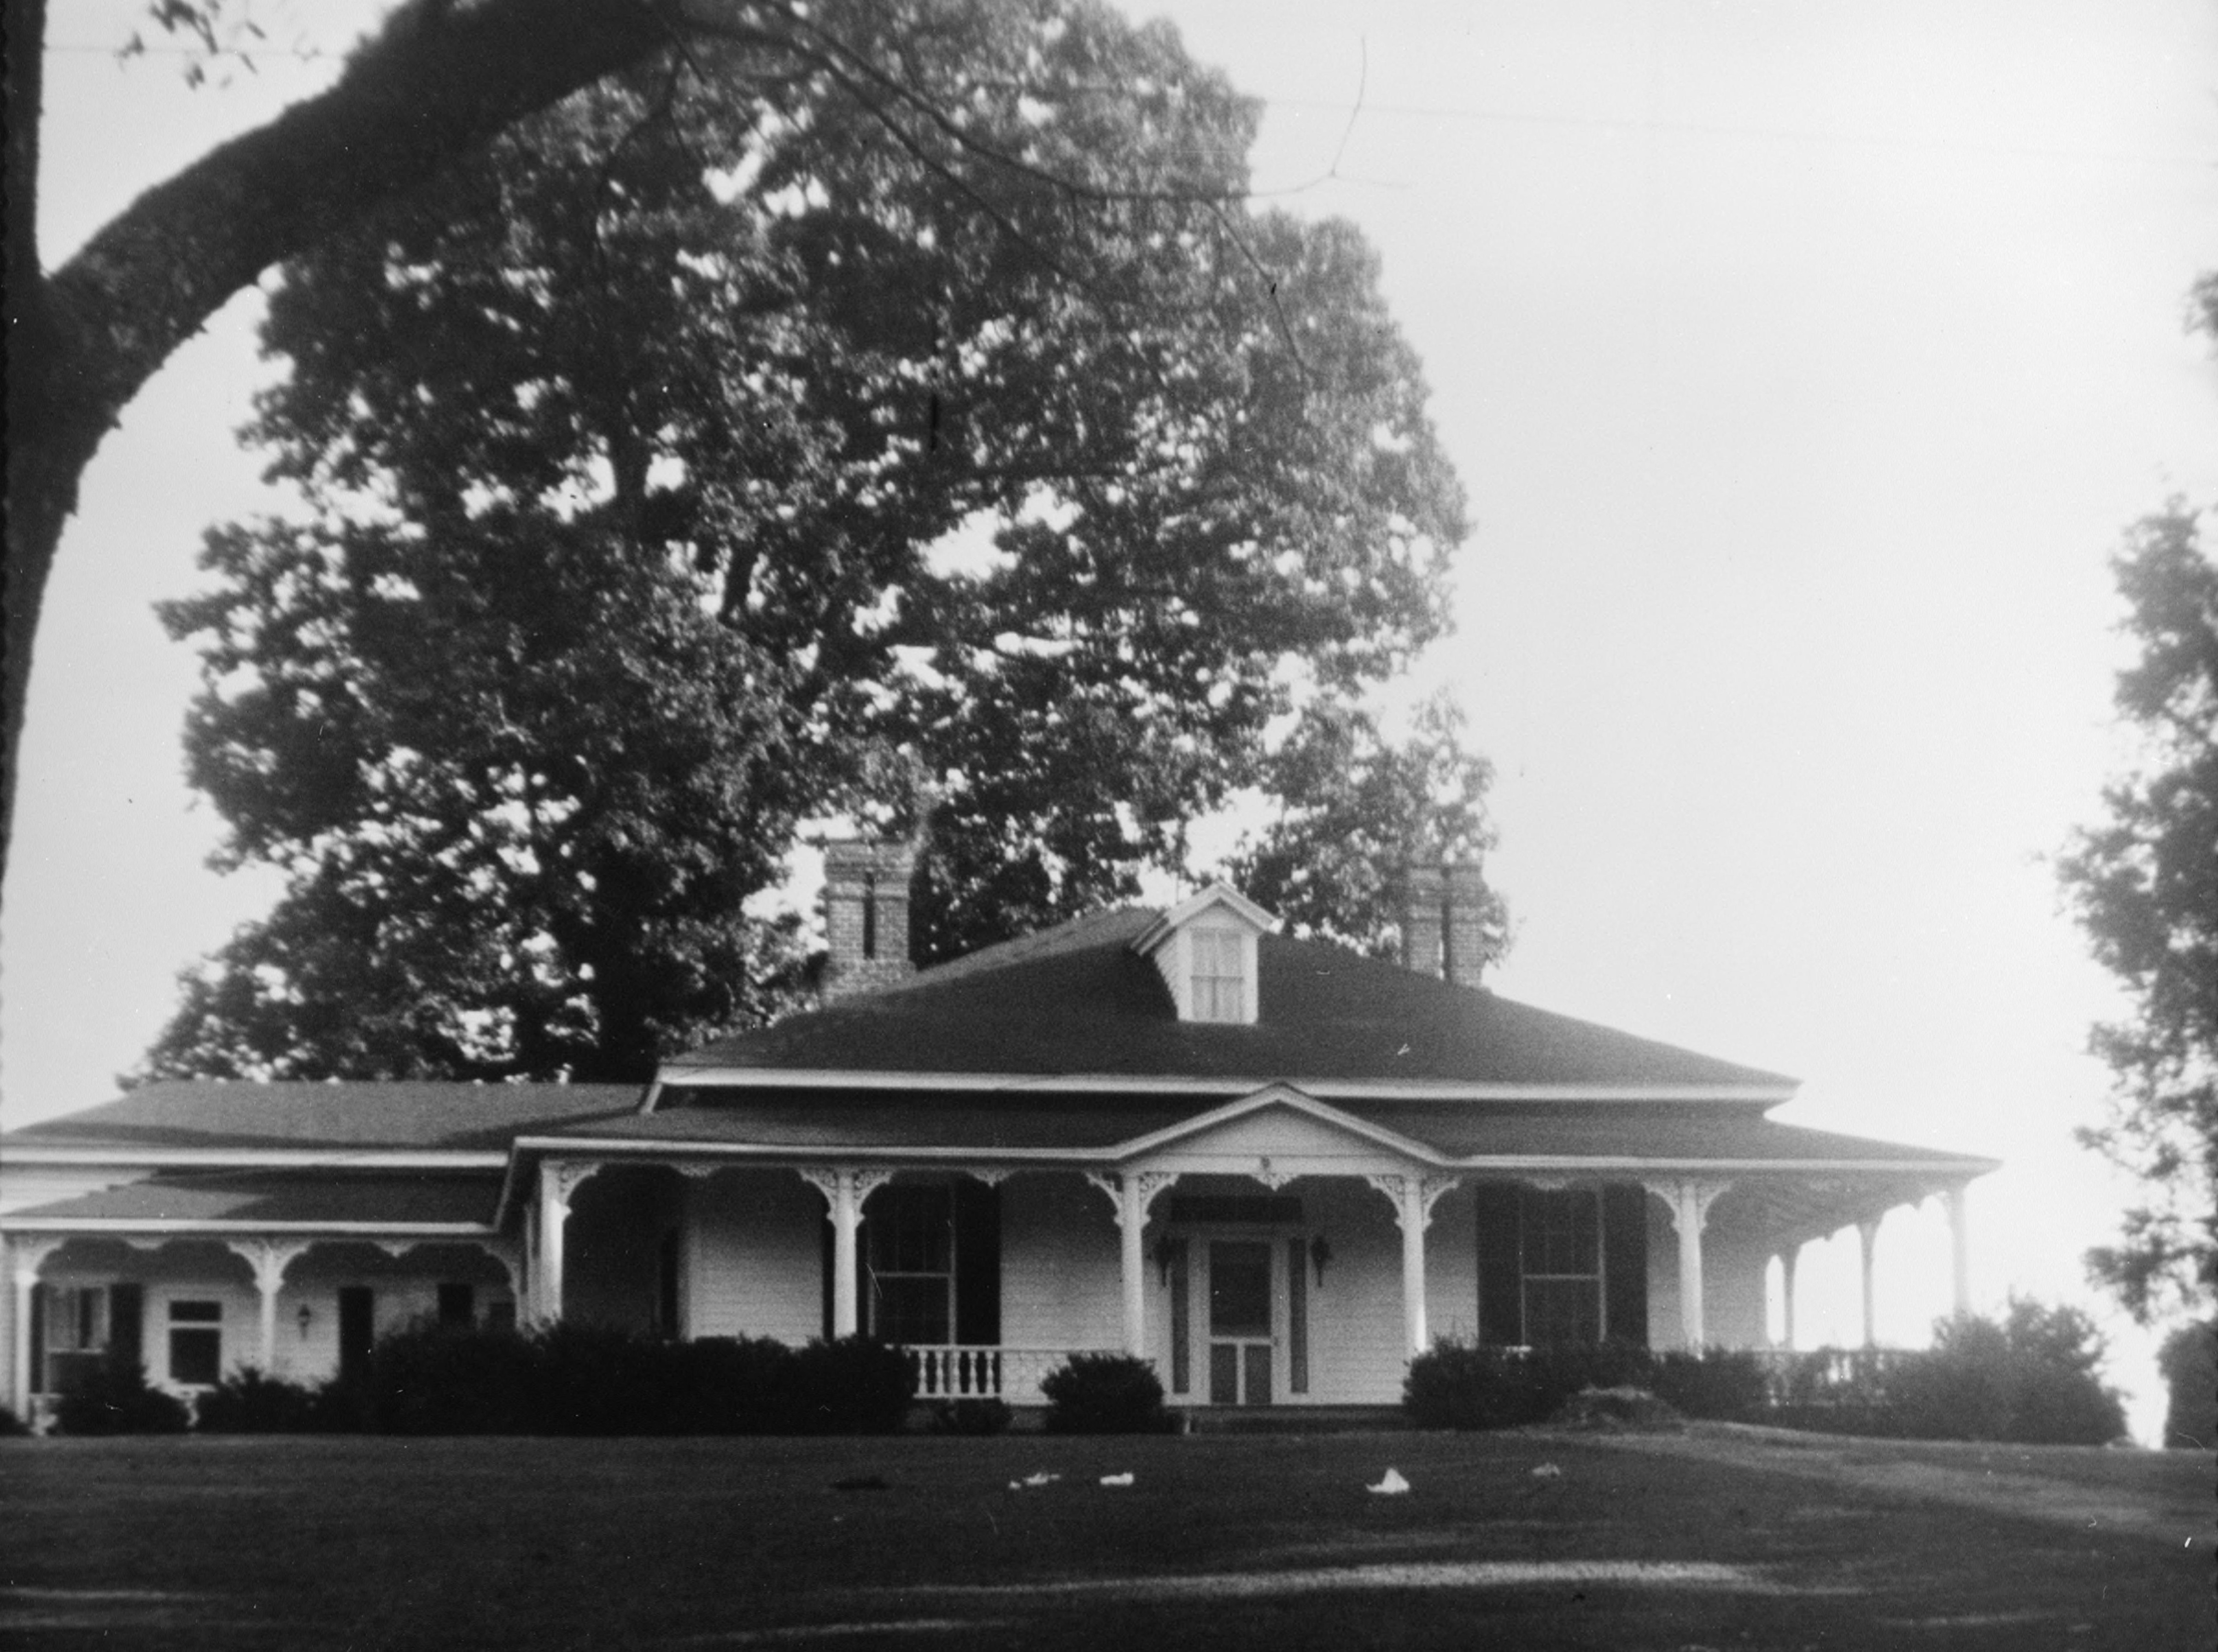 John Gann House